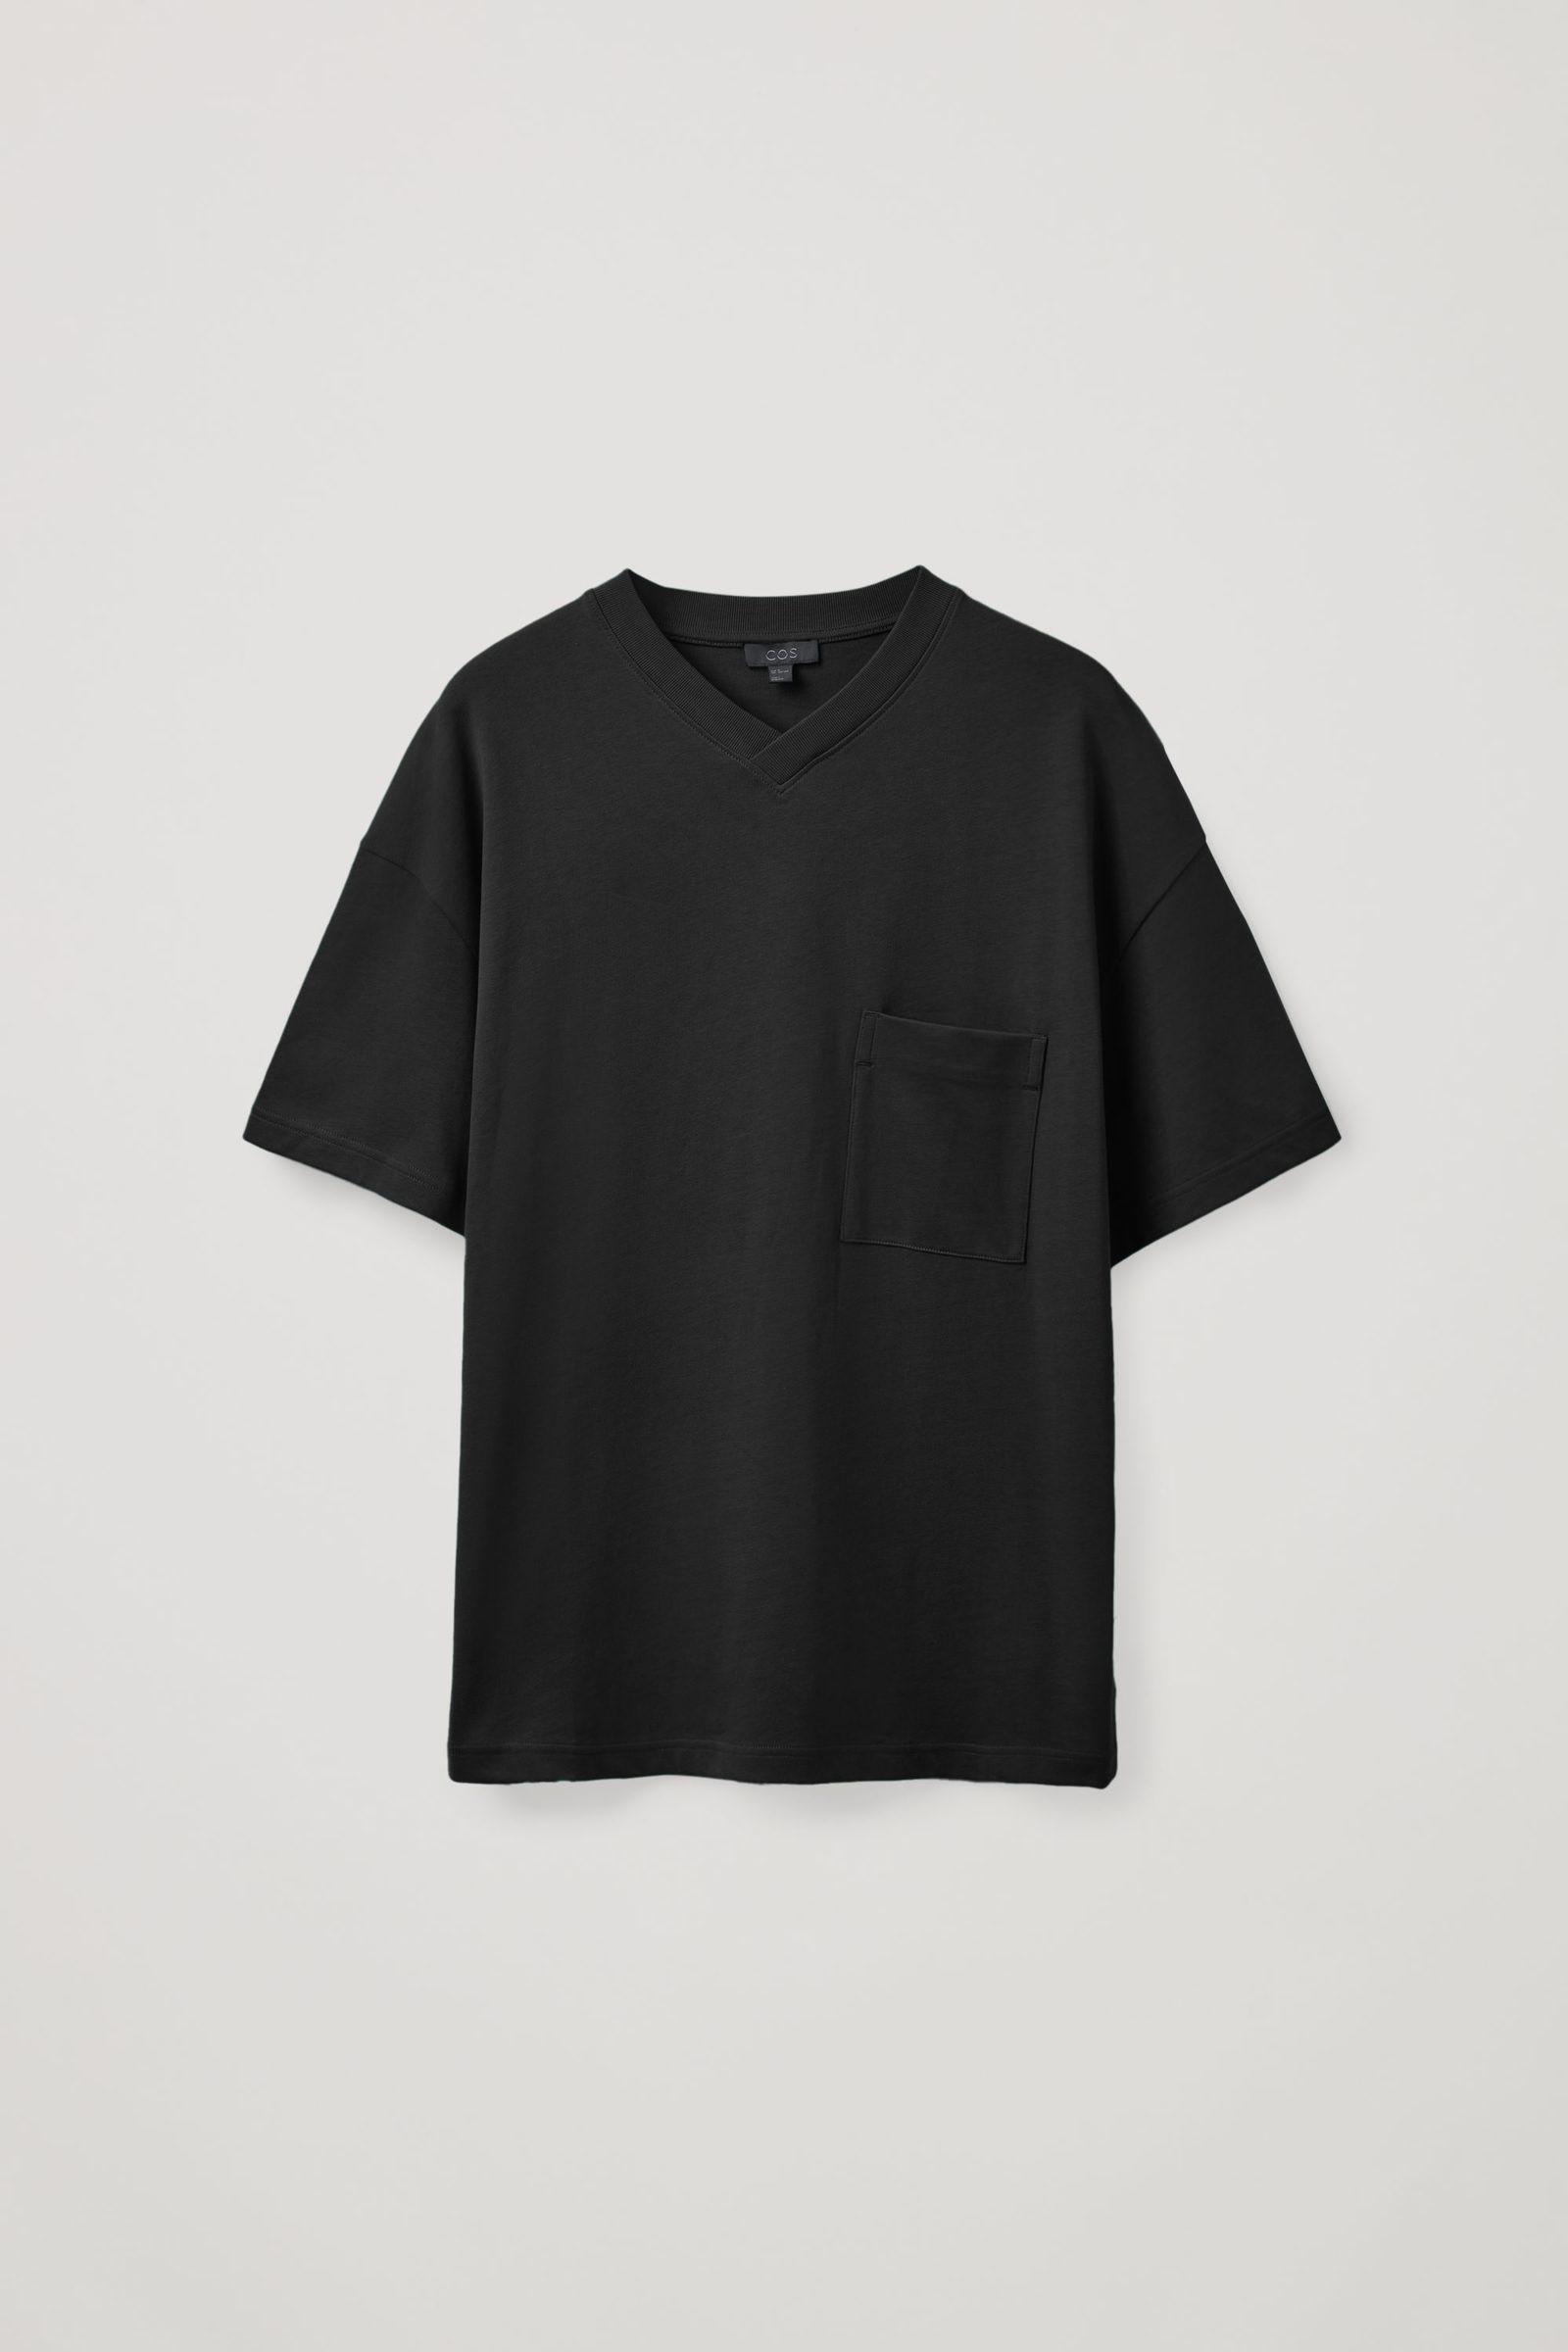 COS 오버사이즈 브이넥 티셔츠의 블랙컬러 Product입니다.